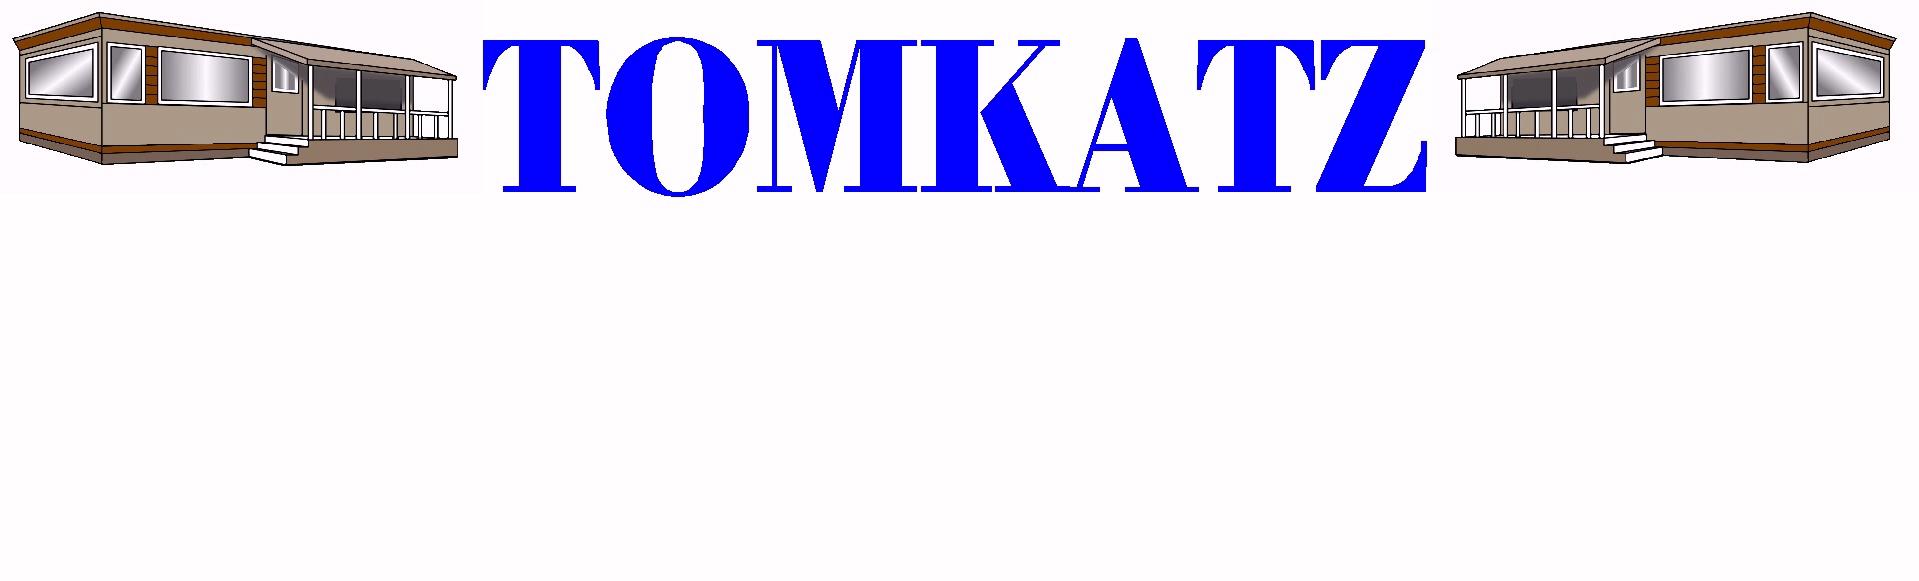 Tomkatz Manufactured Home Services Inc.